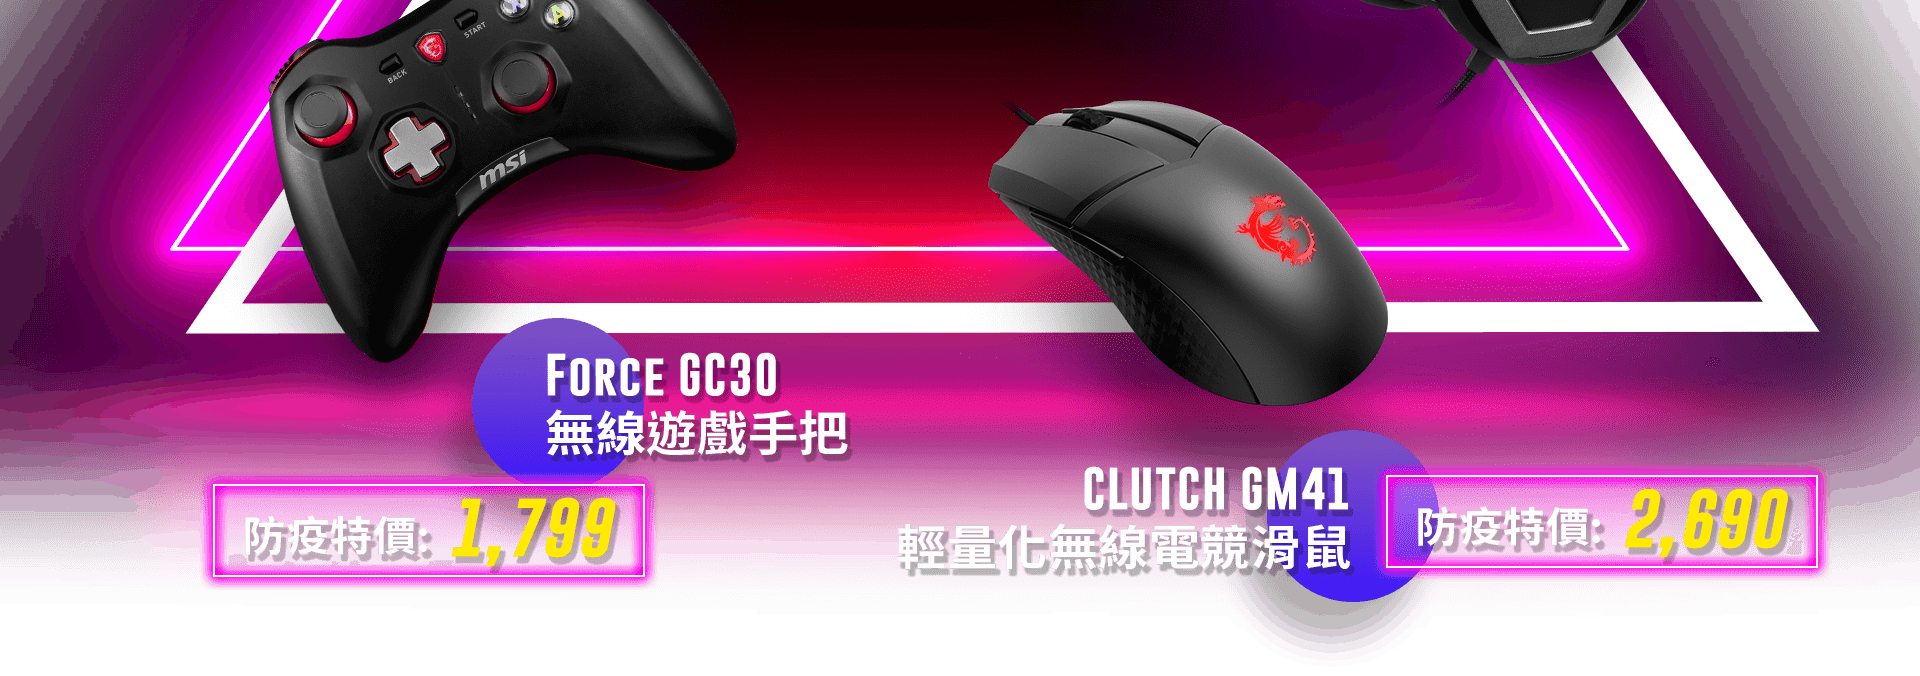 Force GC30 無線遊戲手把 防疫特價:1,799 CLUTCH GM41 輕量化無線電競滑鼠 防疫特價:2,690